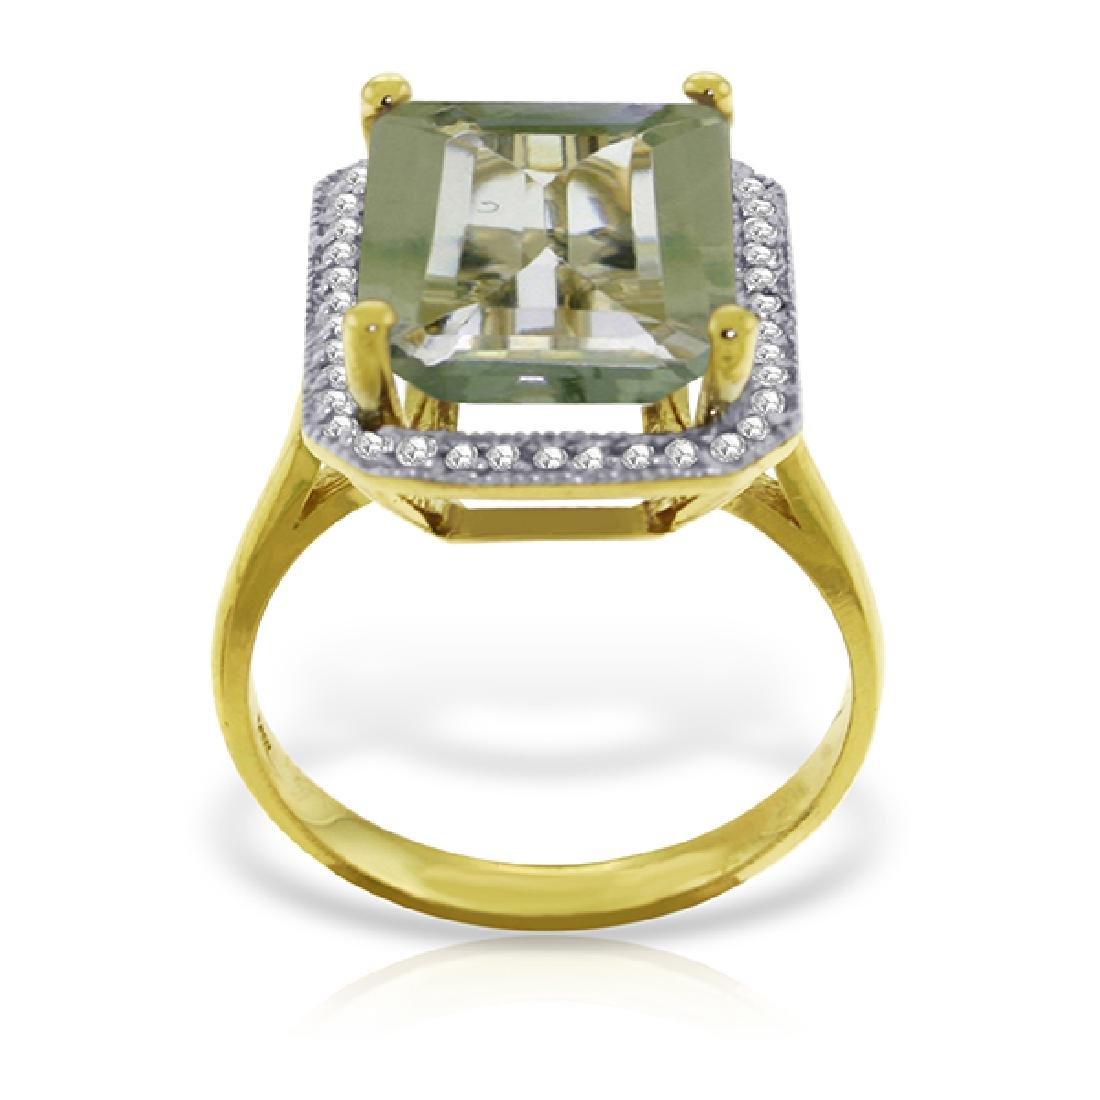 Genuine 5.8 ctw Green Amethyst & Diamond Ring Jewelry